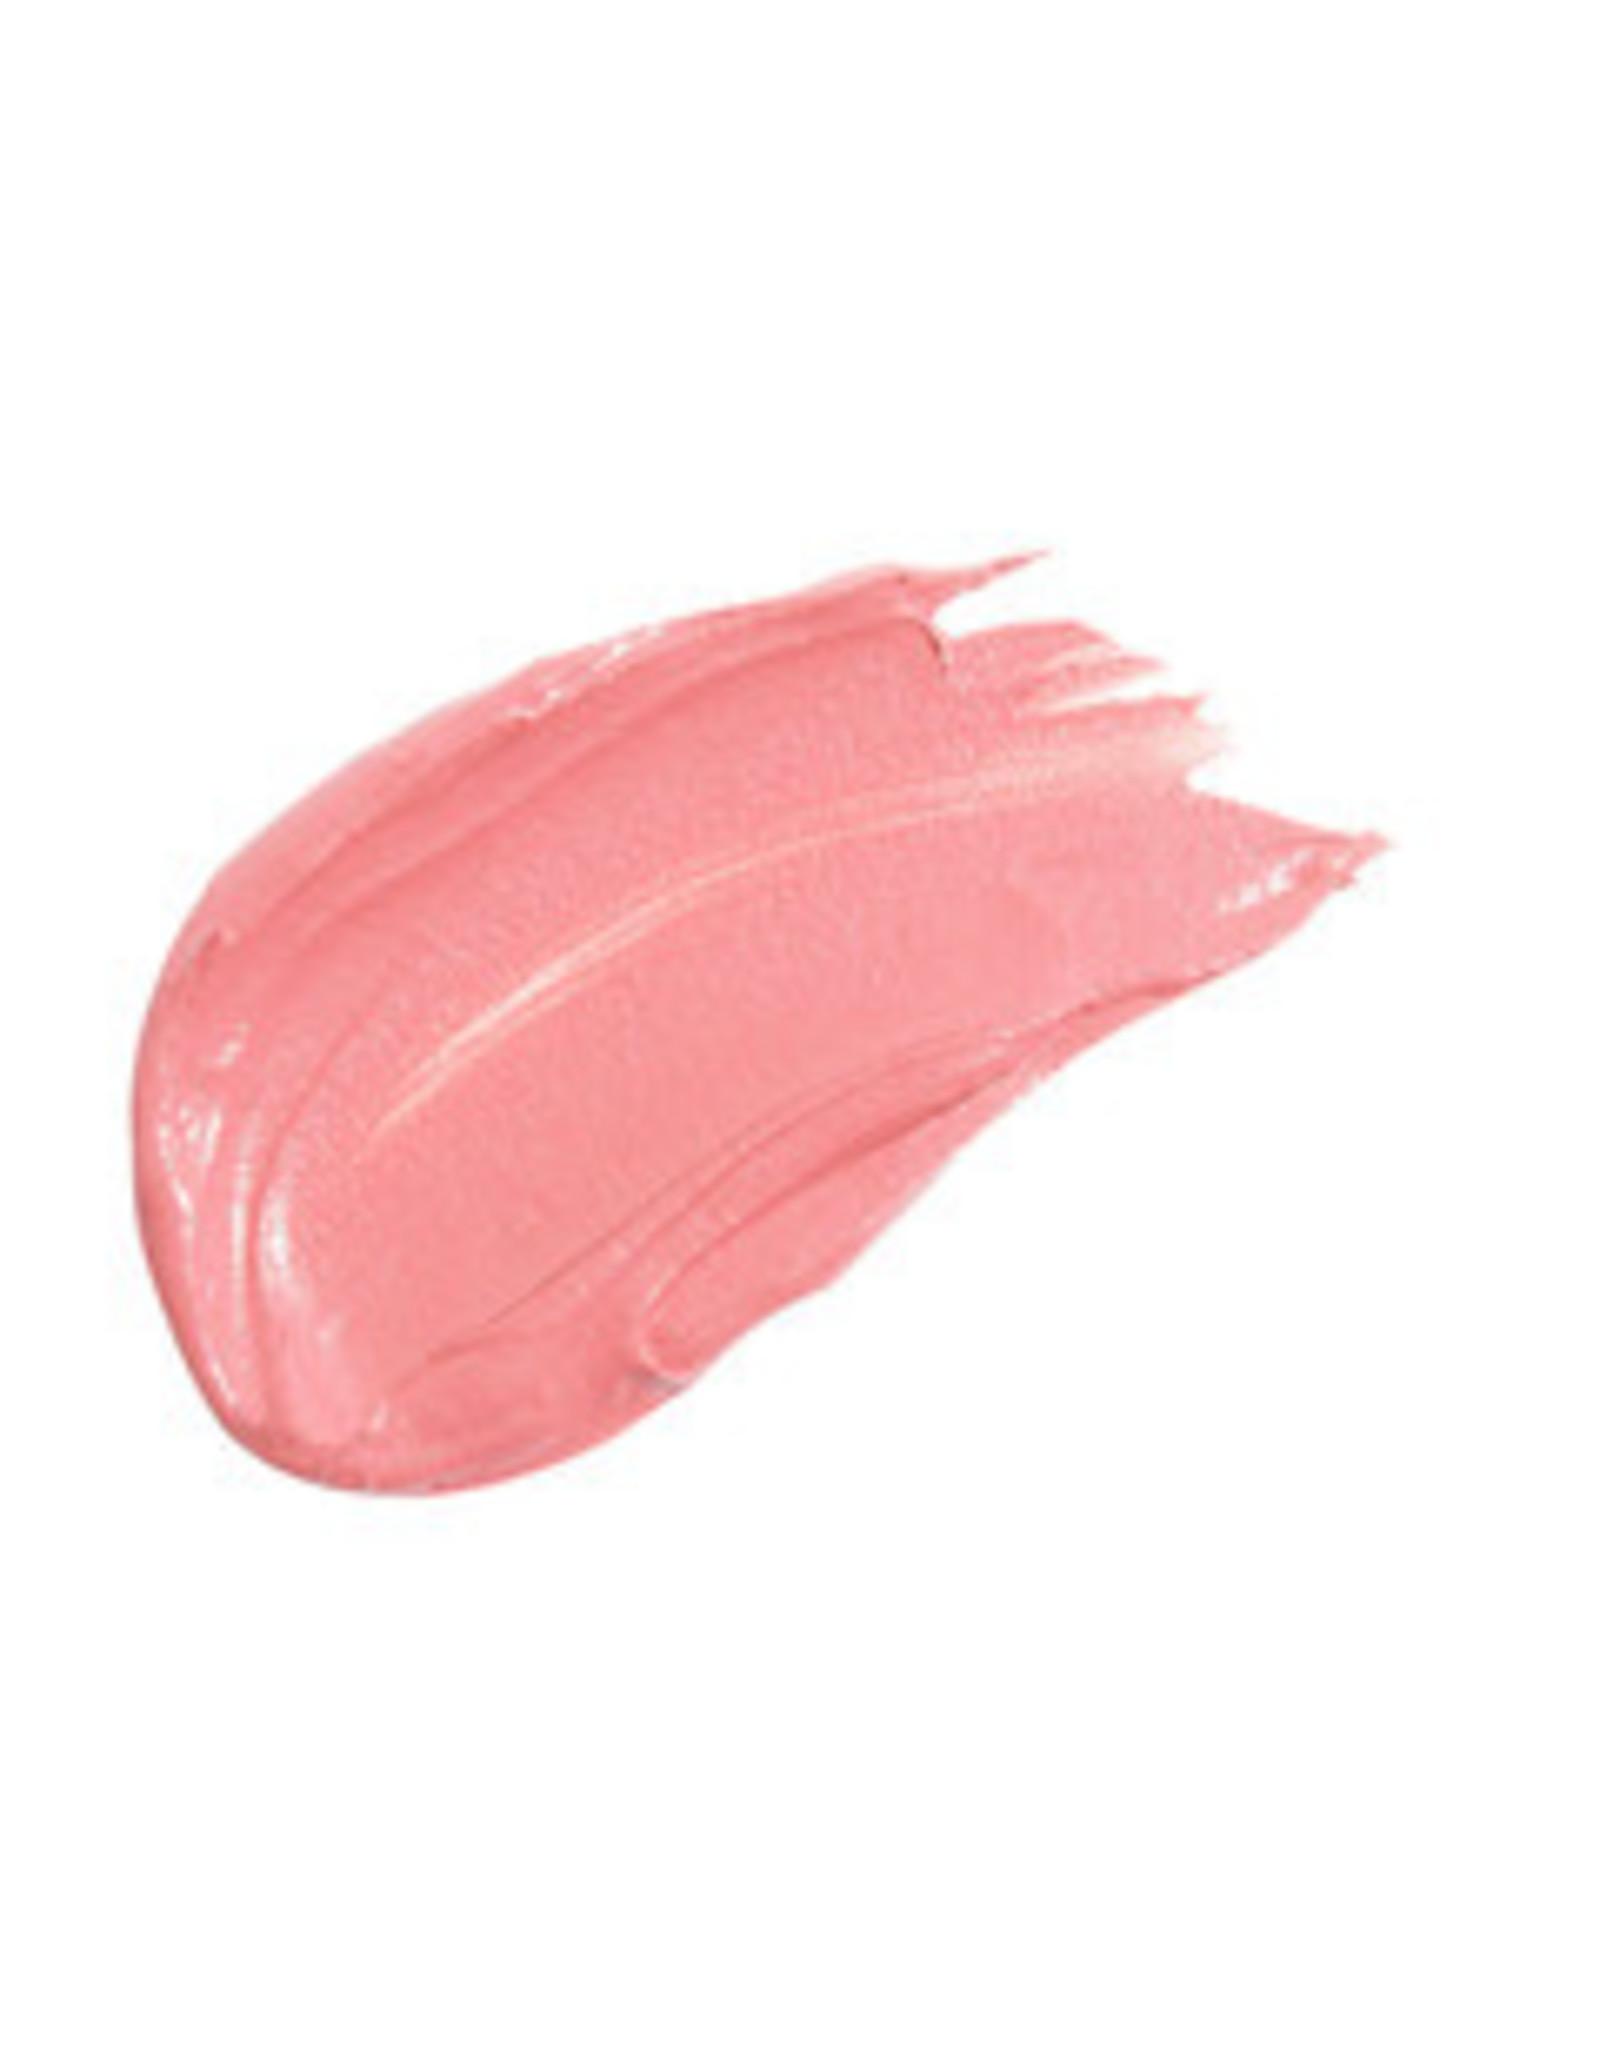 Tata Harper Tata Harper Lip And Cheek Tint (Color: Very Sweet)